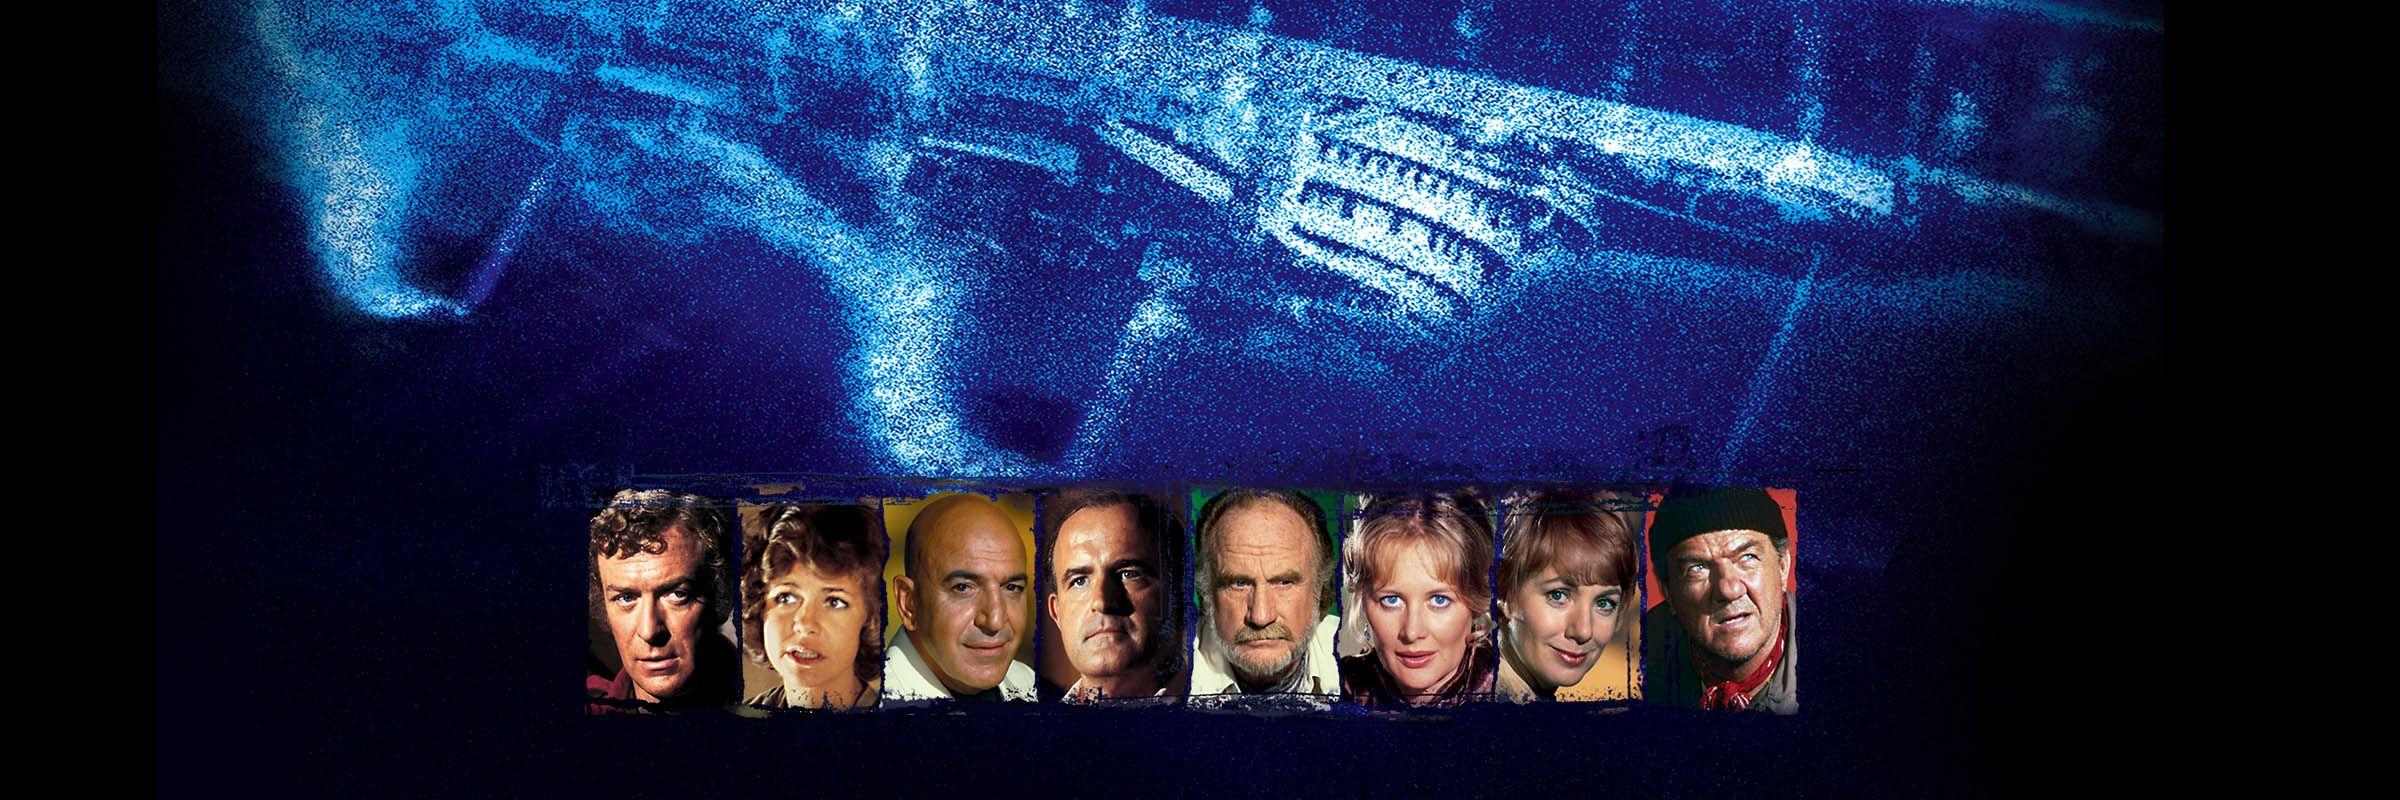 Beyond The Poseidon Adventure Full Movie Movies Anywhere